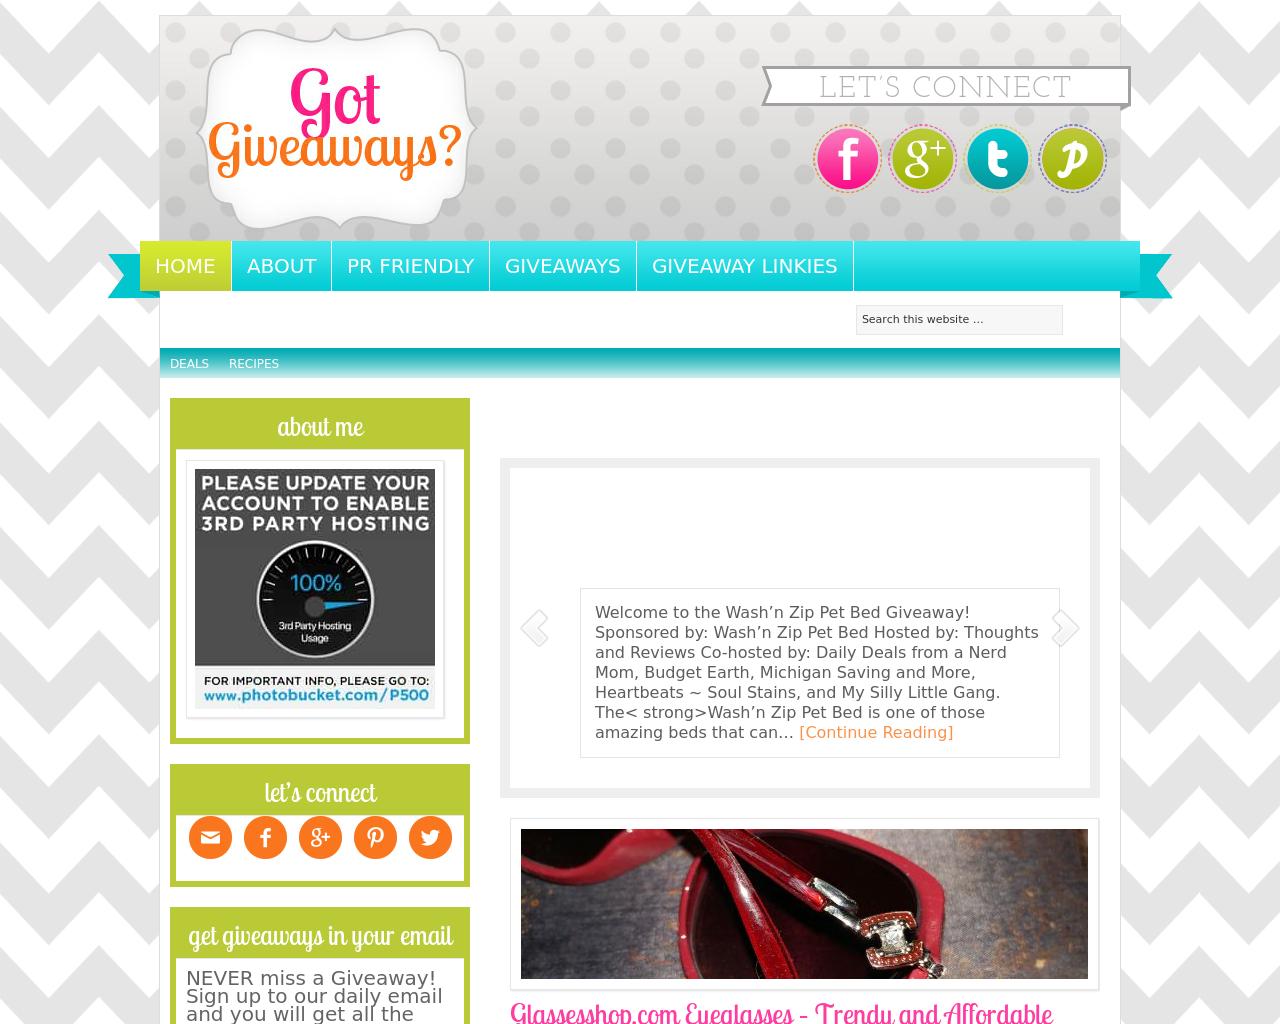 Got-Giveaways-Advertising-Reviews-Pricing